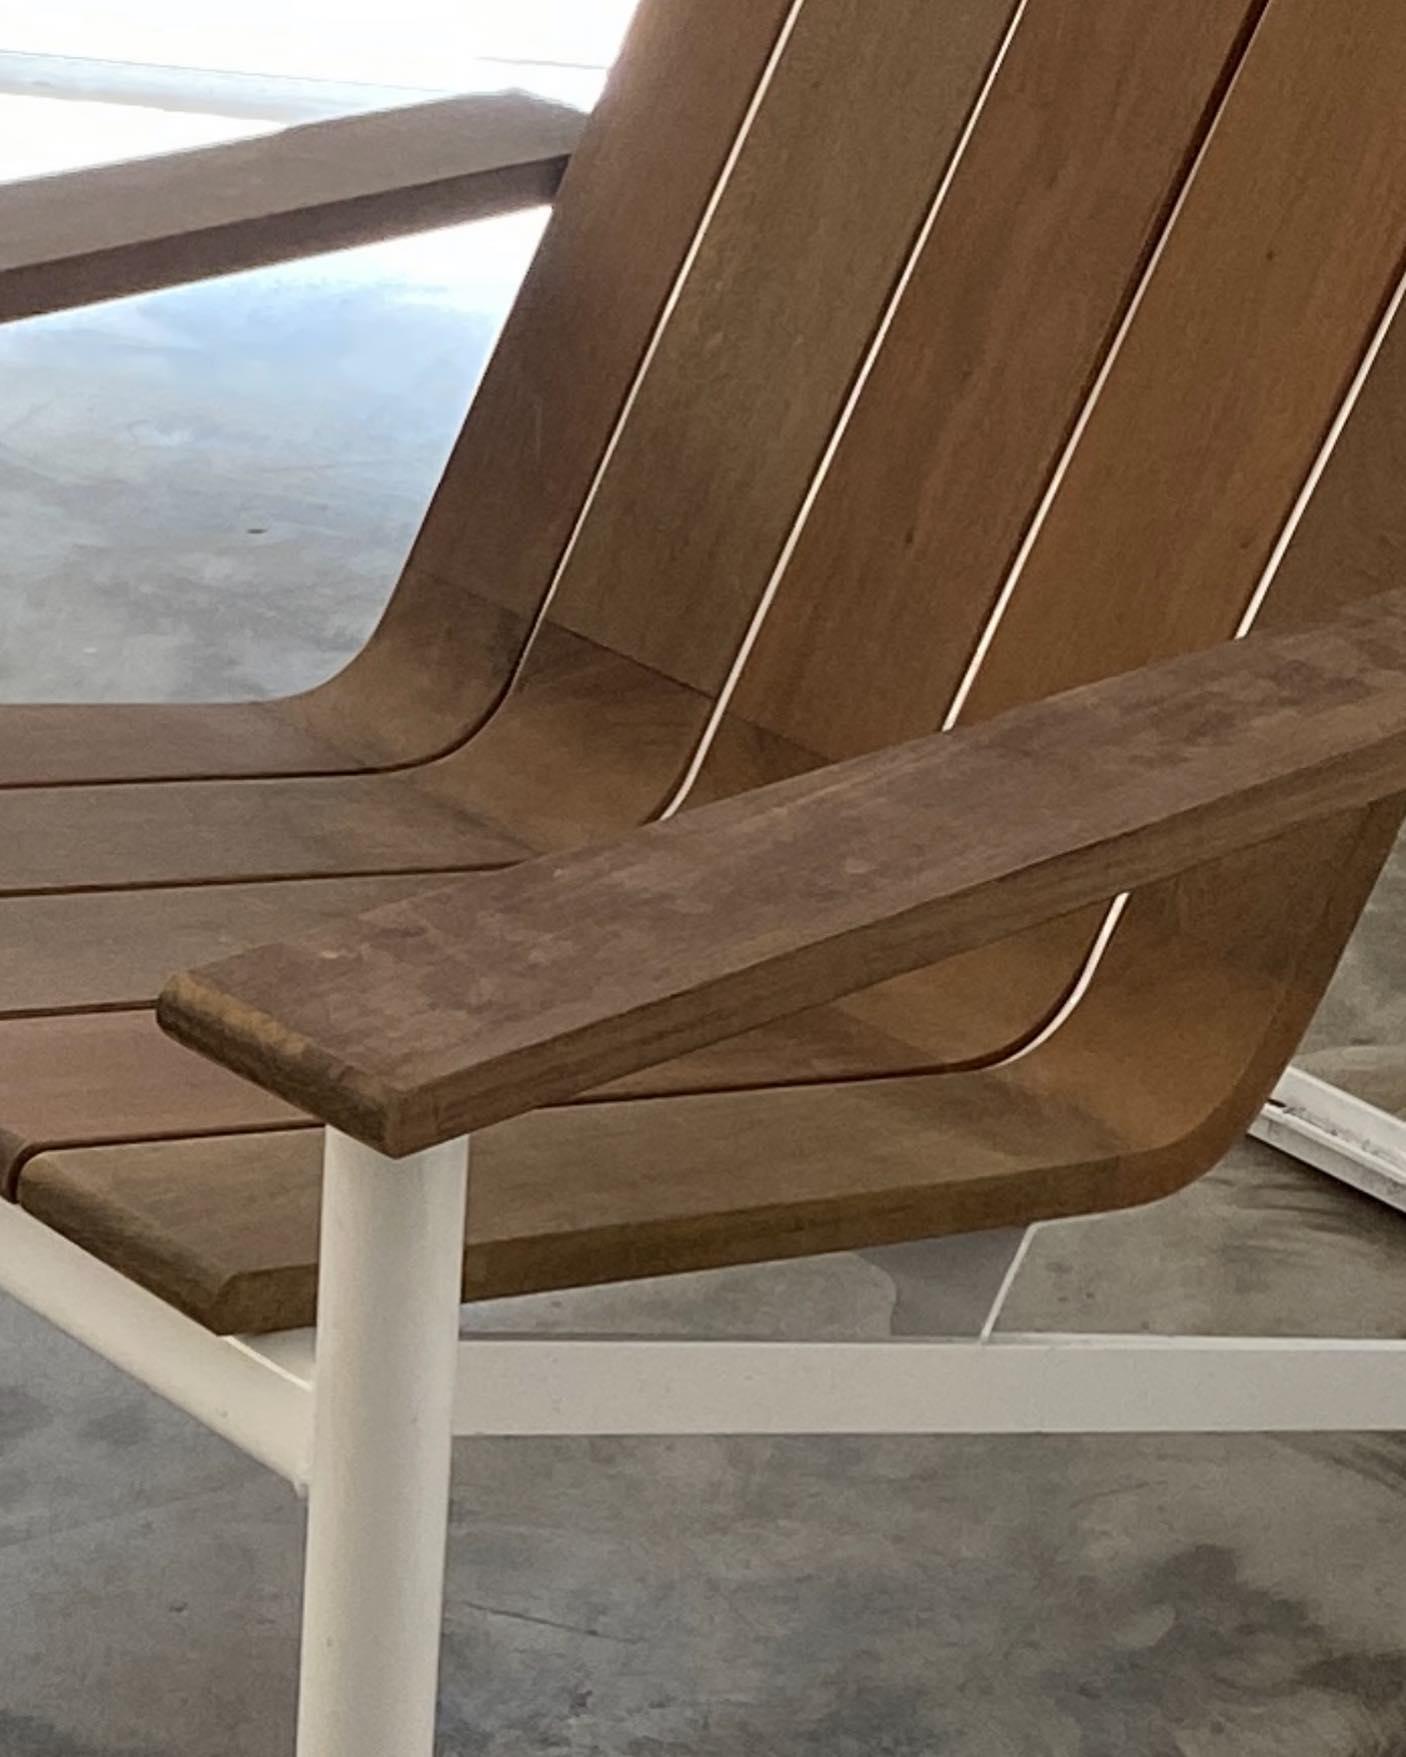 Detail of a custom Ipe deck chair. #makrjournal